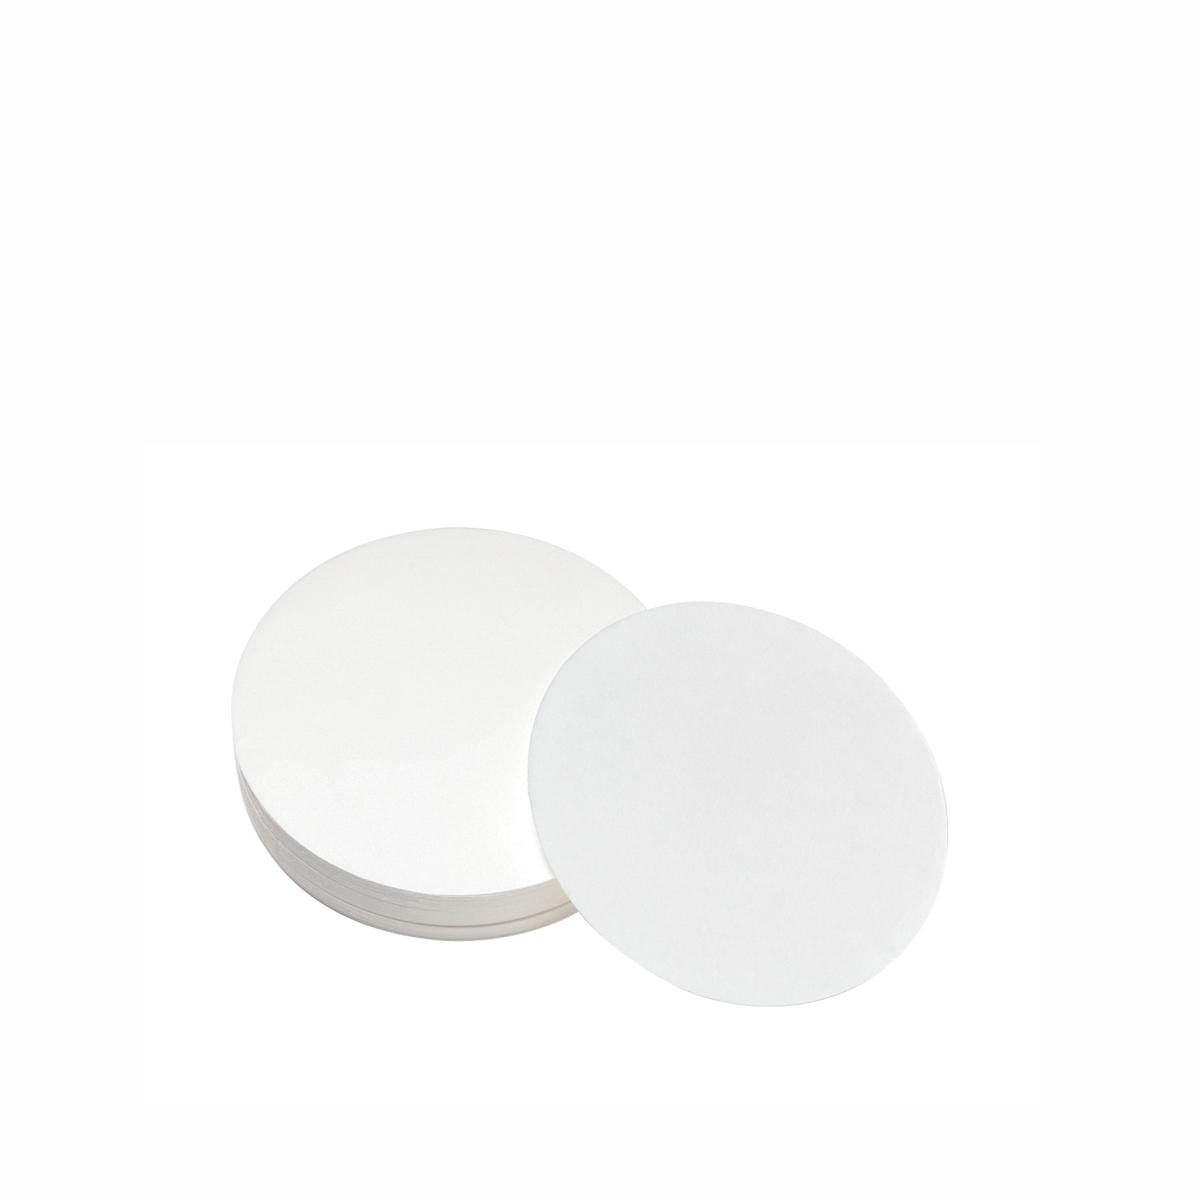 Papel Filtro Tipo Mata Borrão Gramatura 250 g 125 mm (100 unidades)